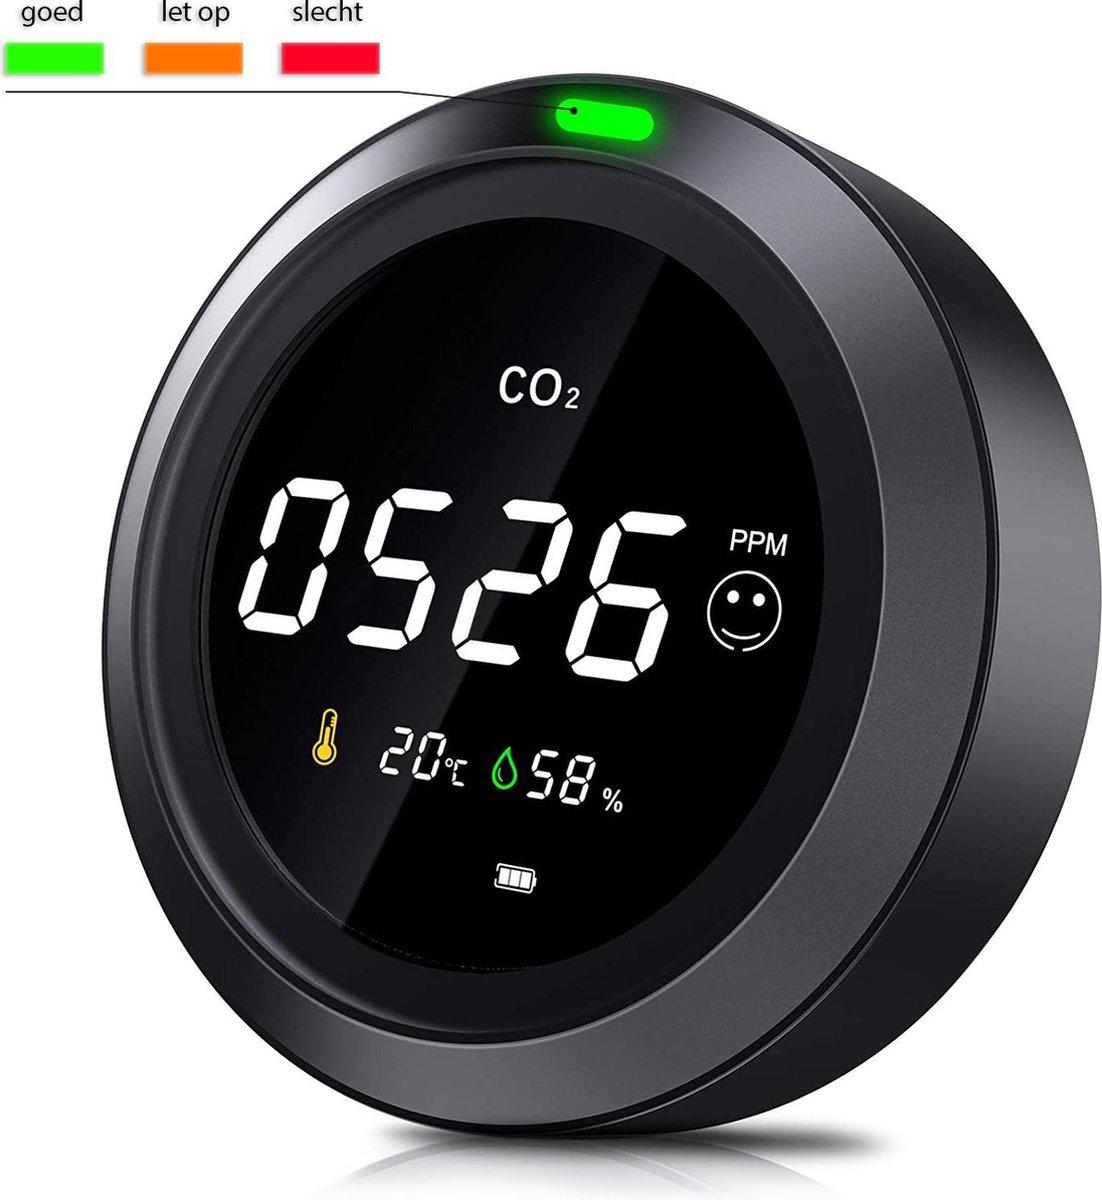 CO2 meter - CO2 melder - CO2 monitor - Hygrometer - Luchtvochtigheidsmeter - Oplaadbaar, draagbaar e